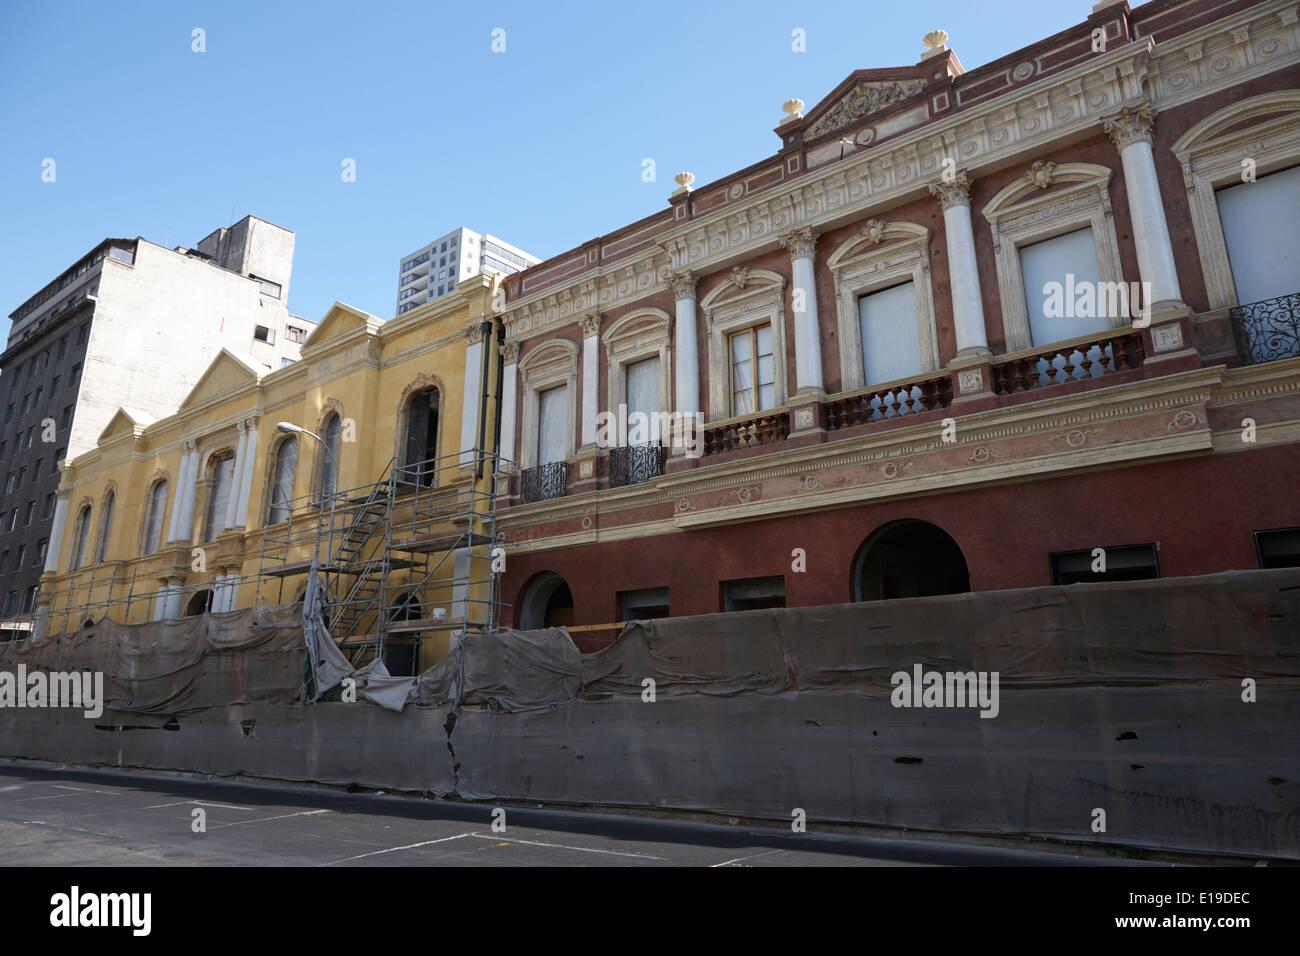 restoration of old buildings